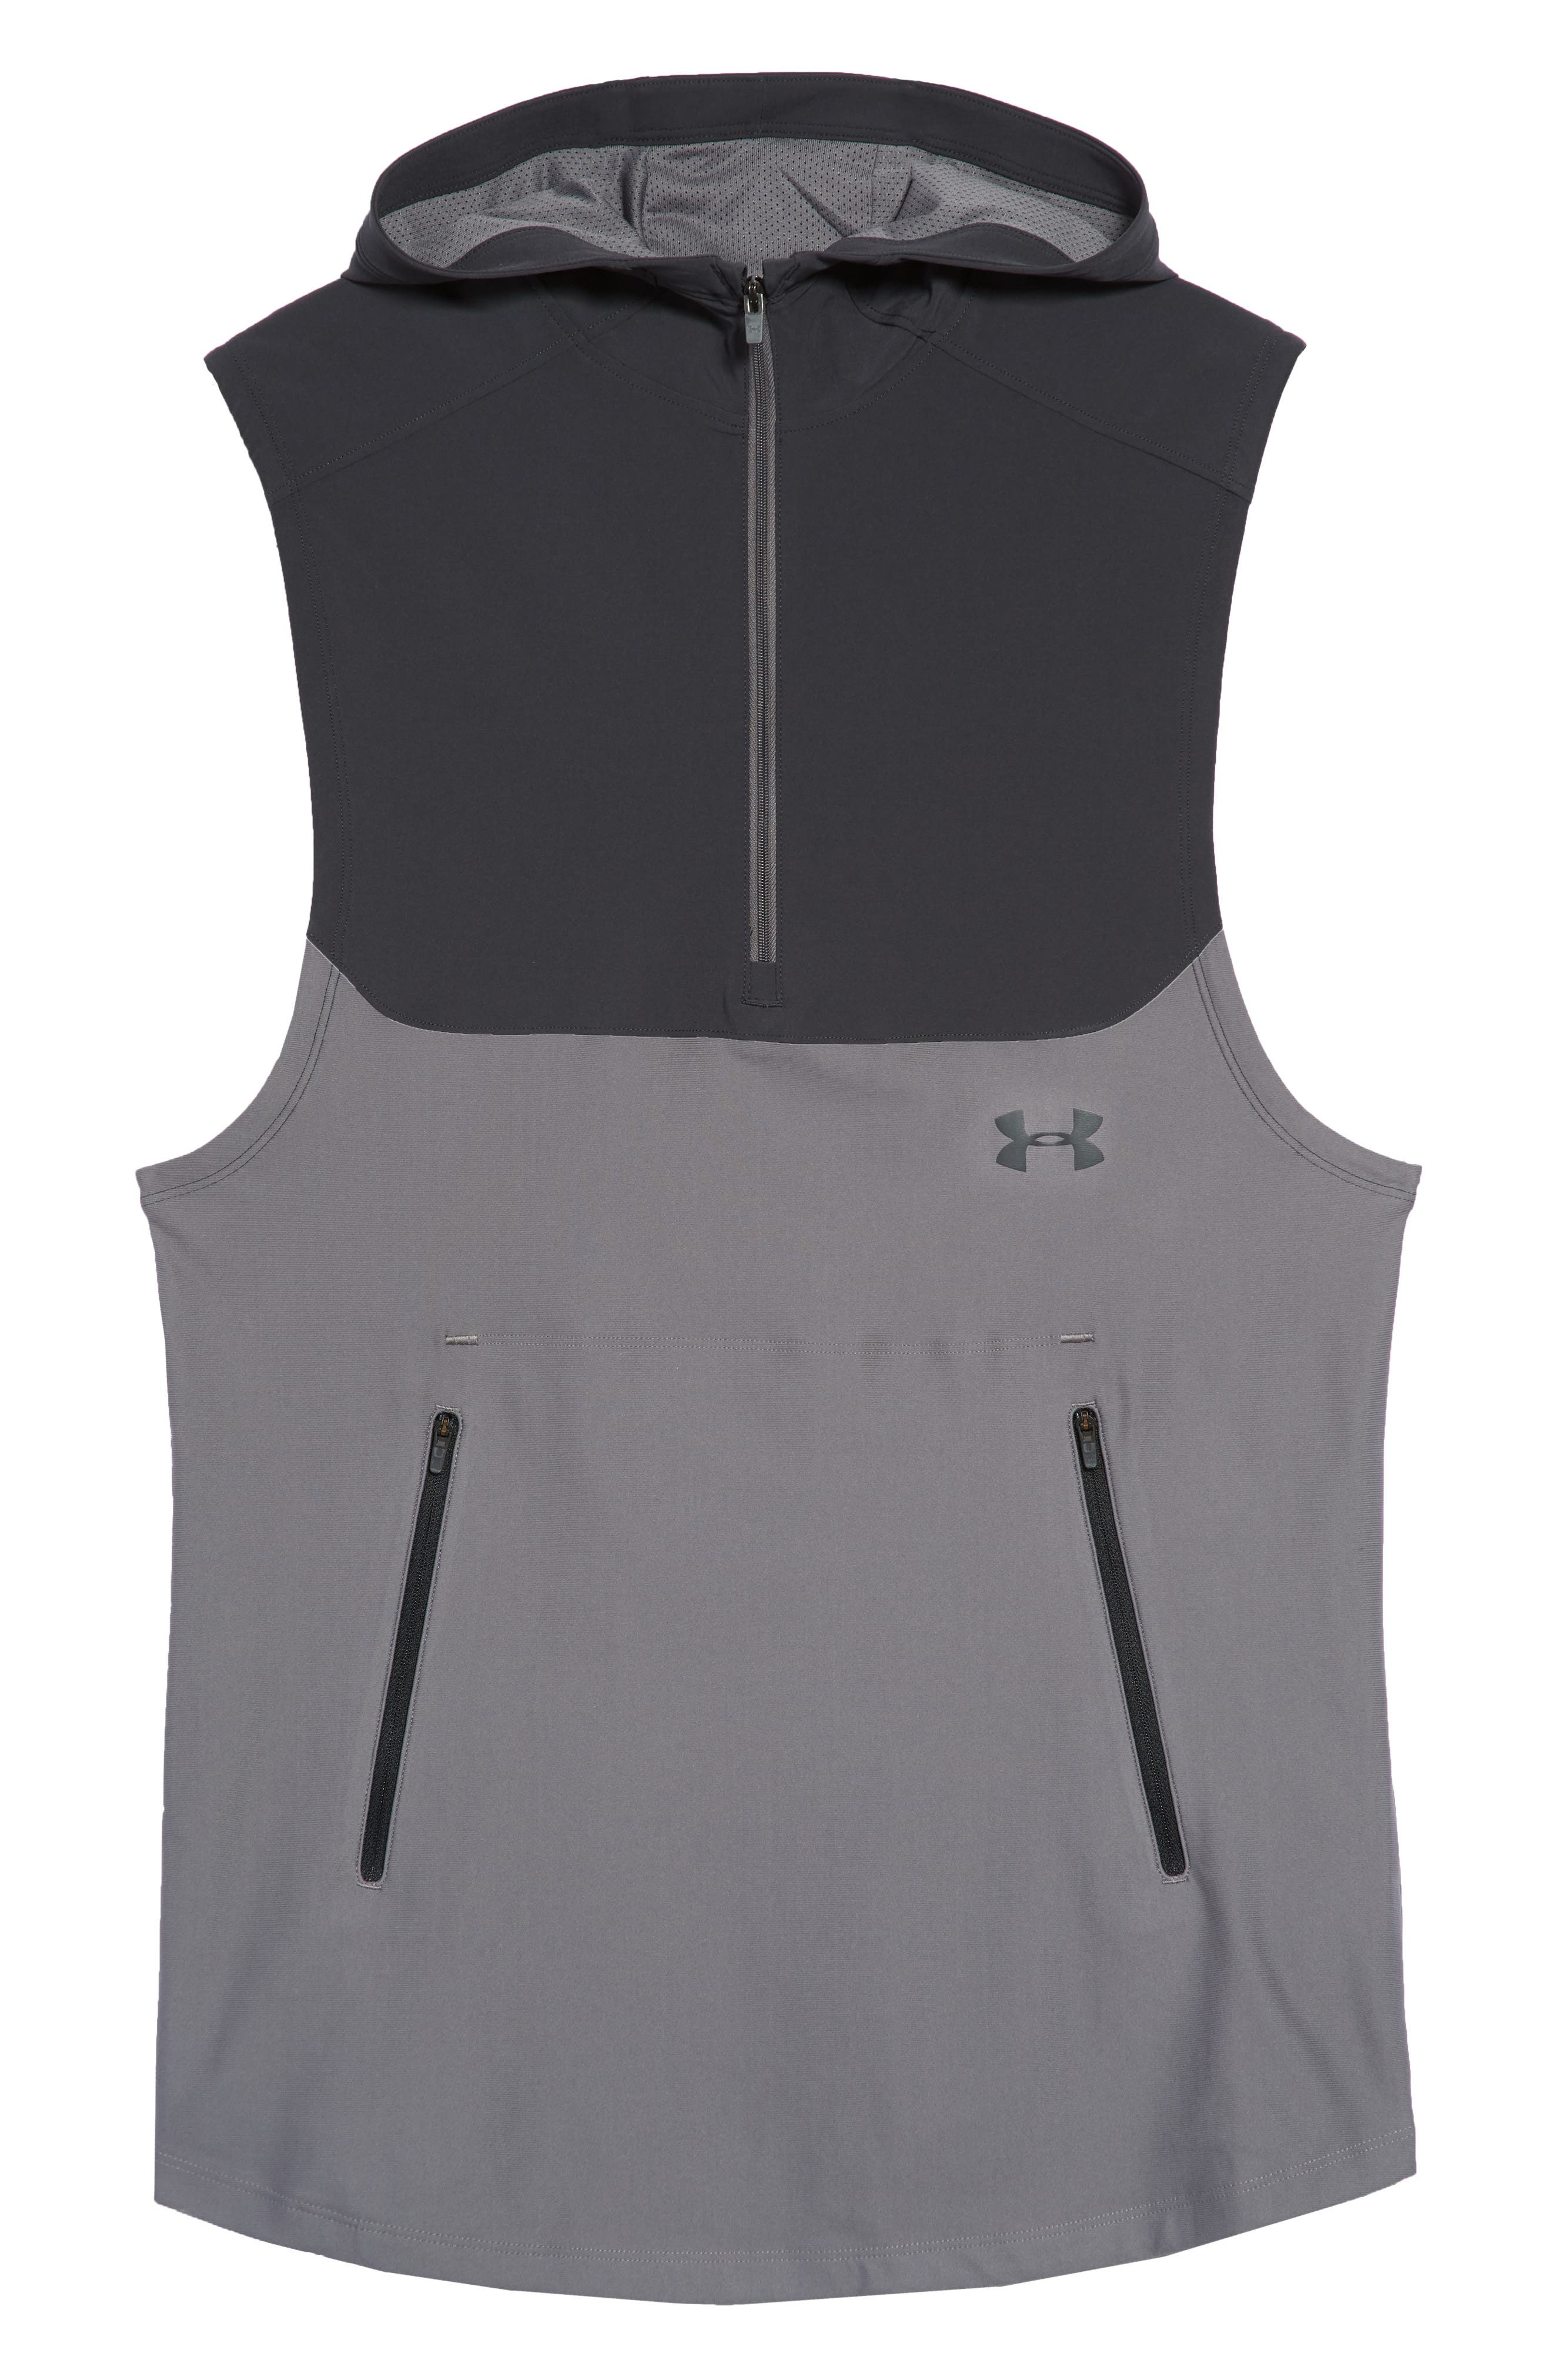 Threadborne Vanish Vest,                             Alternate thumbnail 6, color,                             Anthracite / Graphite/ Iron